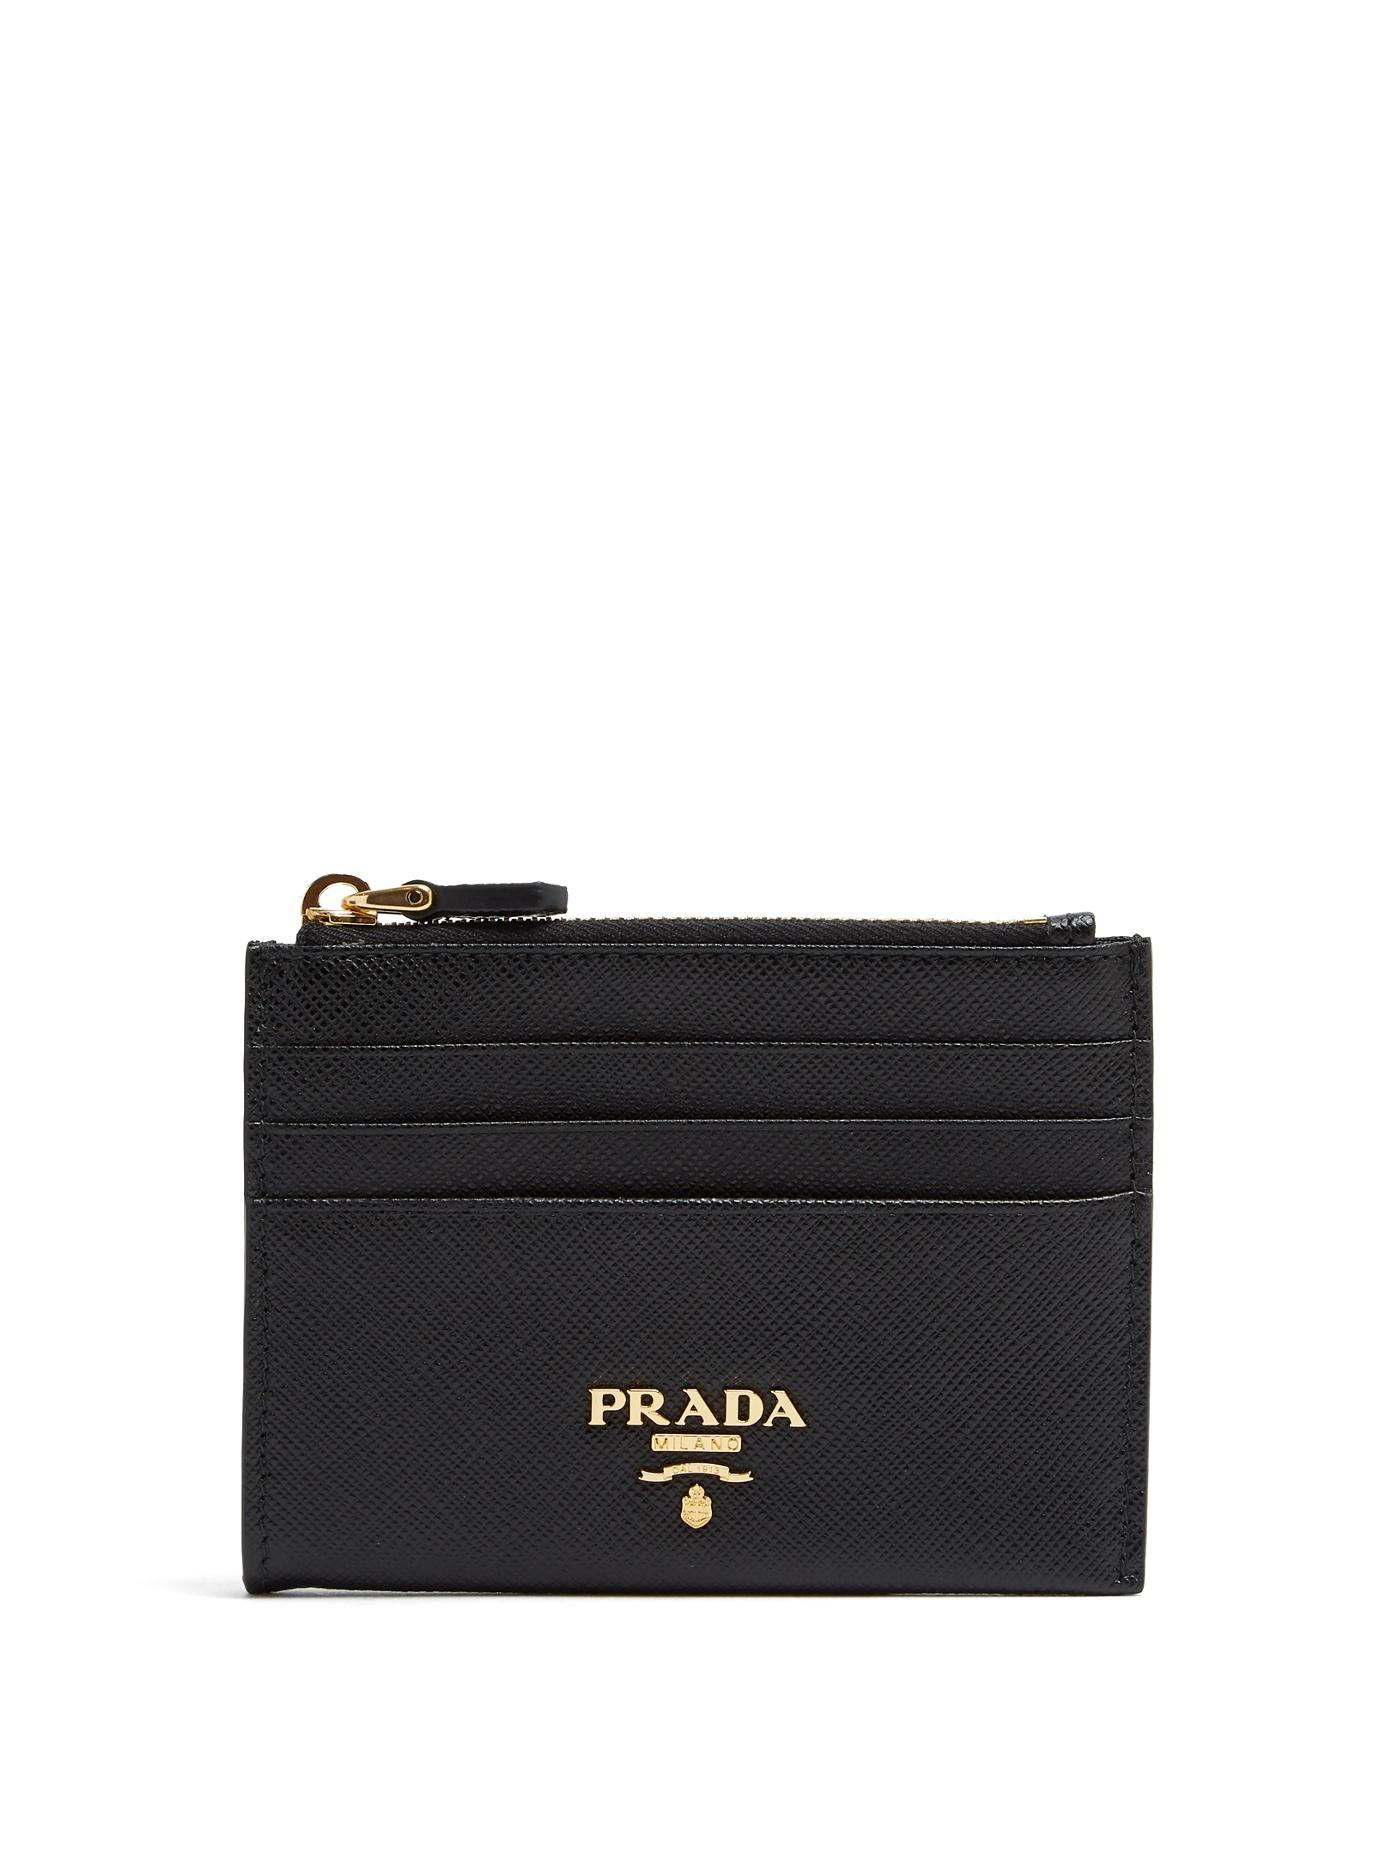 ffdbf72bb0e67 Prada Saffiano Leather Zip Card Holder In Black